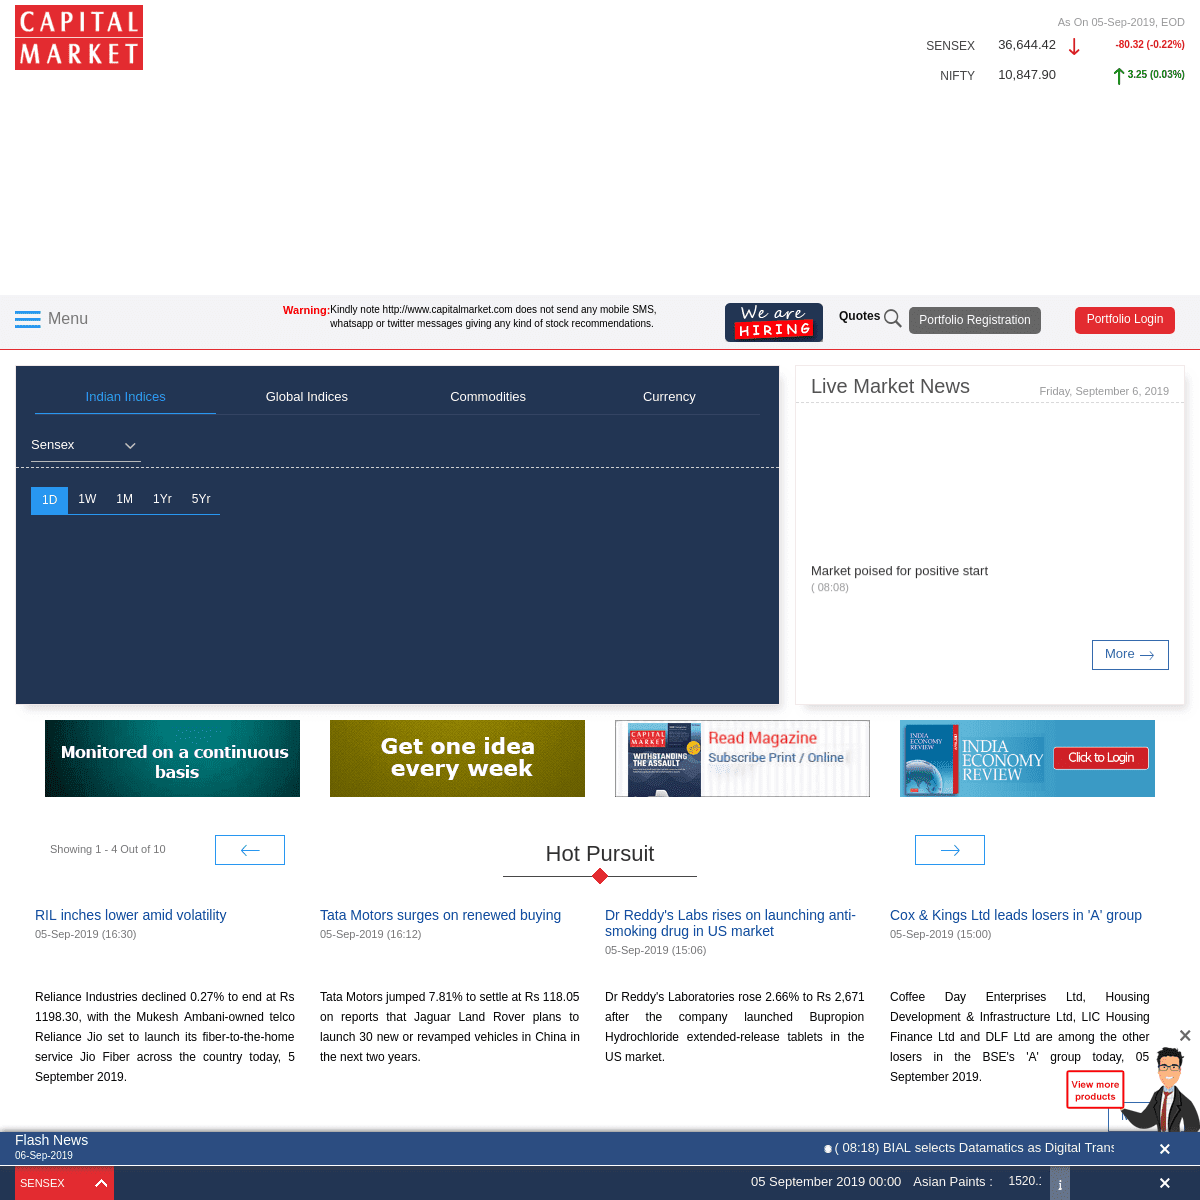 Live market news, Stock prices, Portfolio tracker - Capitalmarket